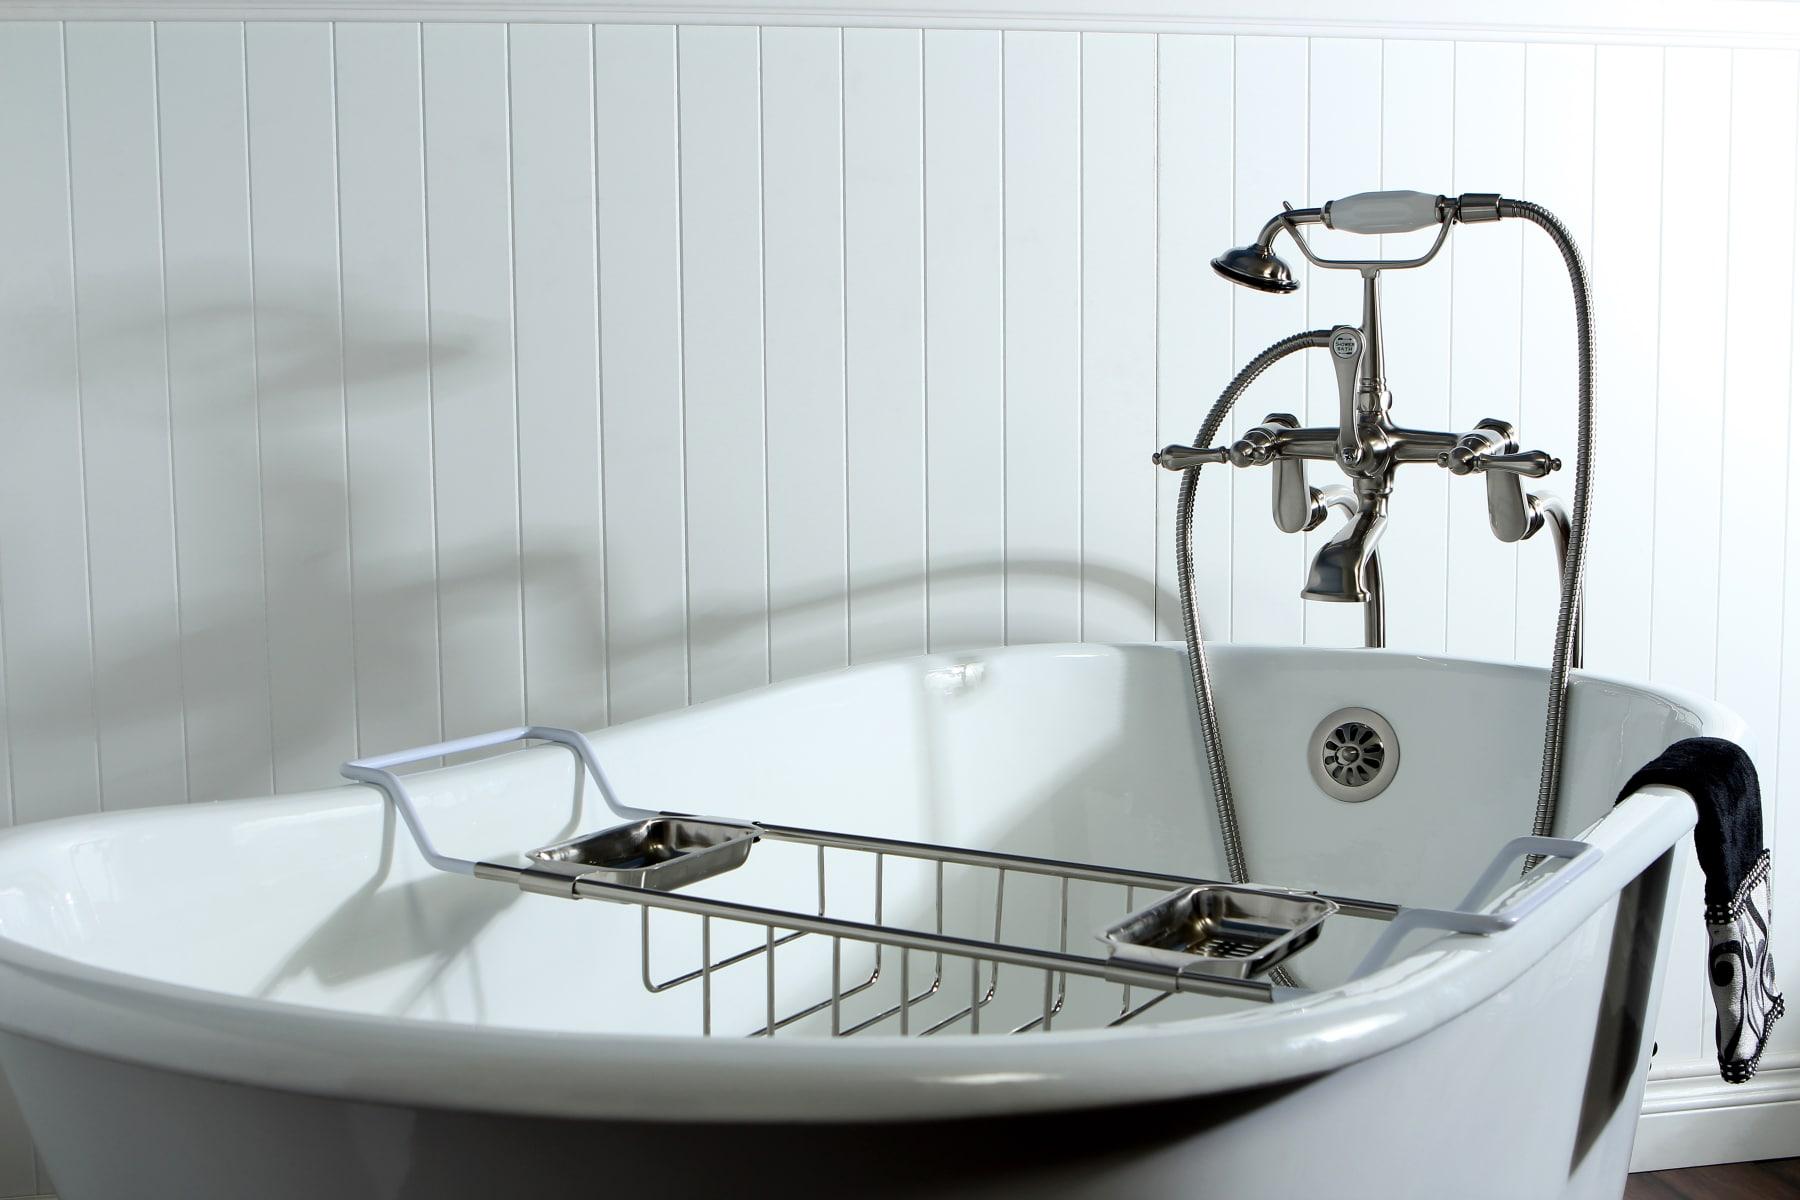 Kingston Brass CC2155 Vintage Claw Foot Bath Tub Shelf Oil Rubbed Bronze 26